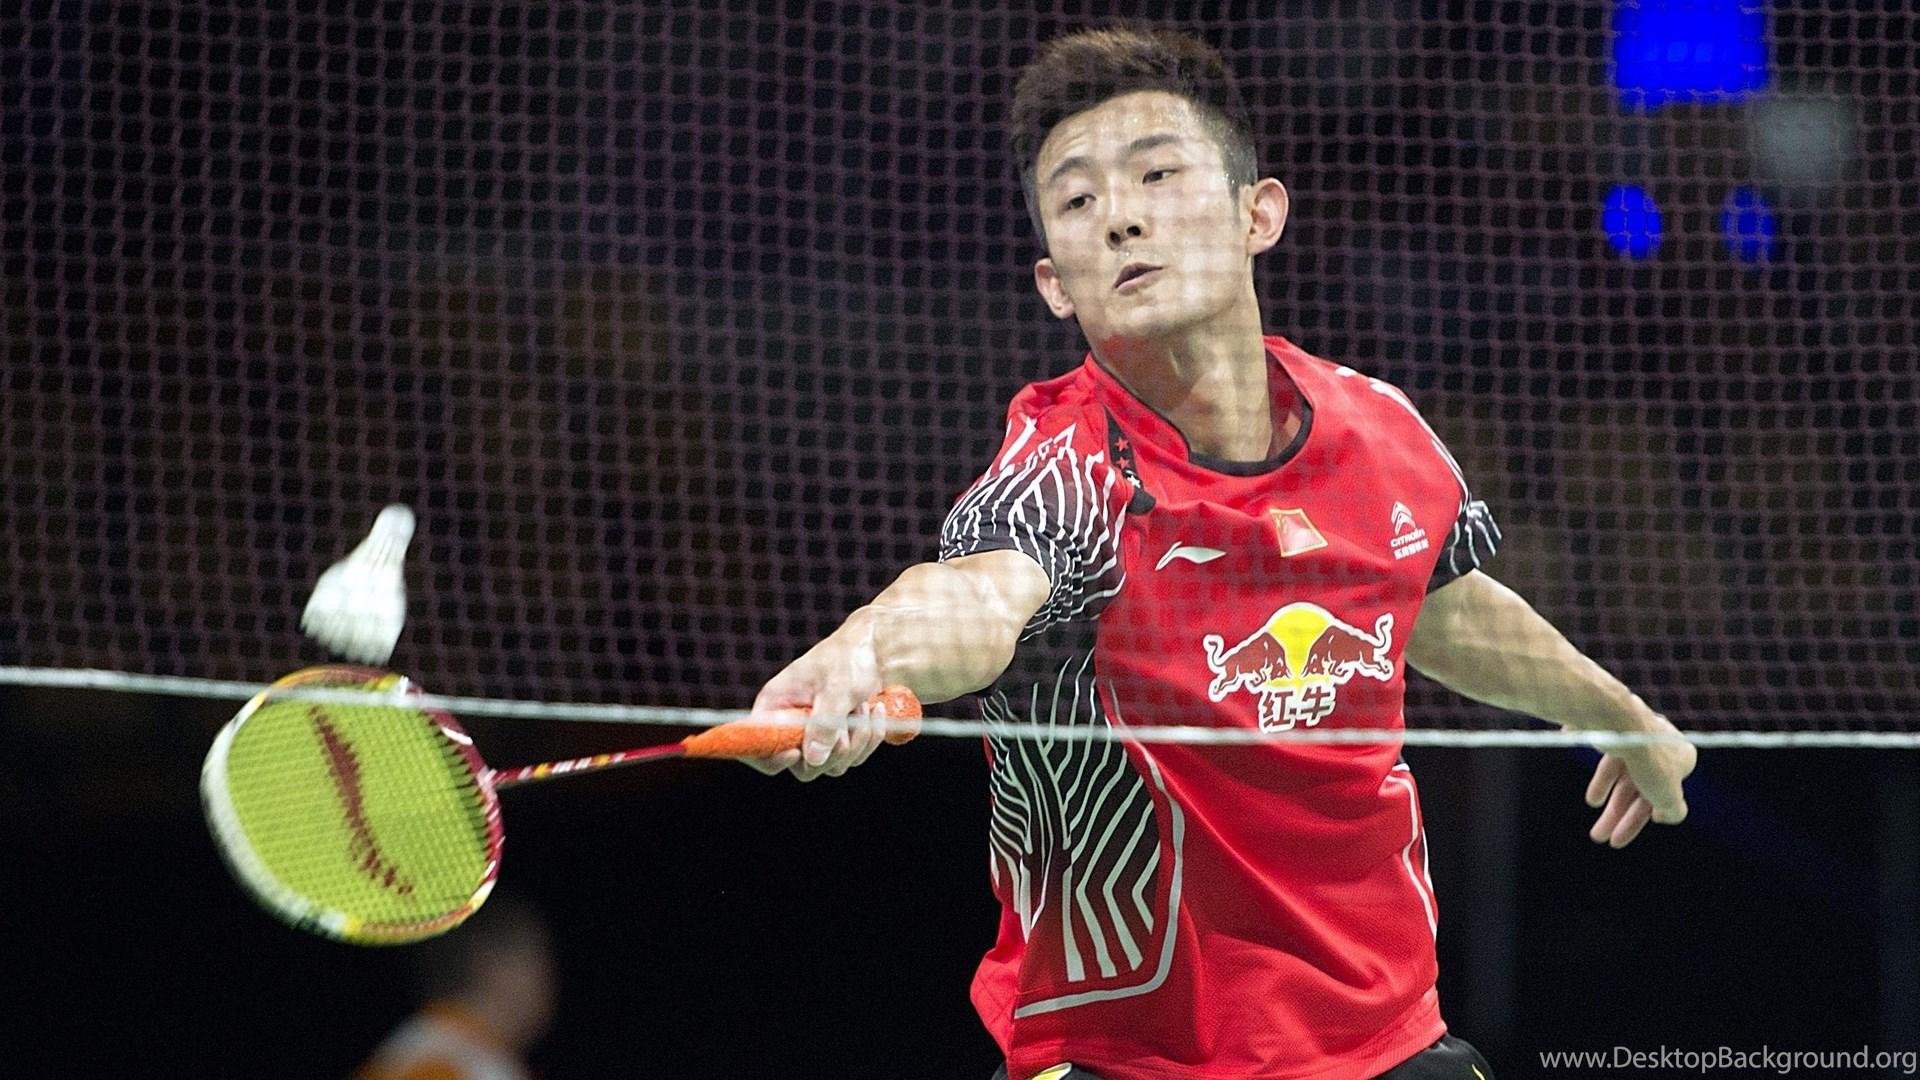 Badminton CHEN Long Sport Widescreen Wallpapers Desktop Background